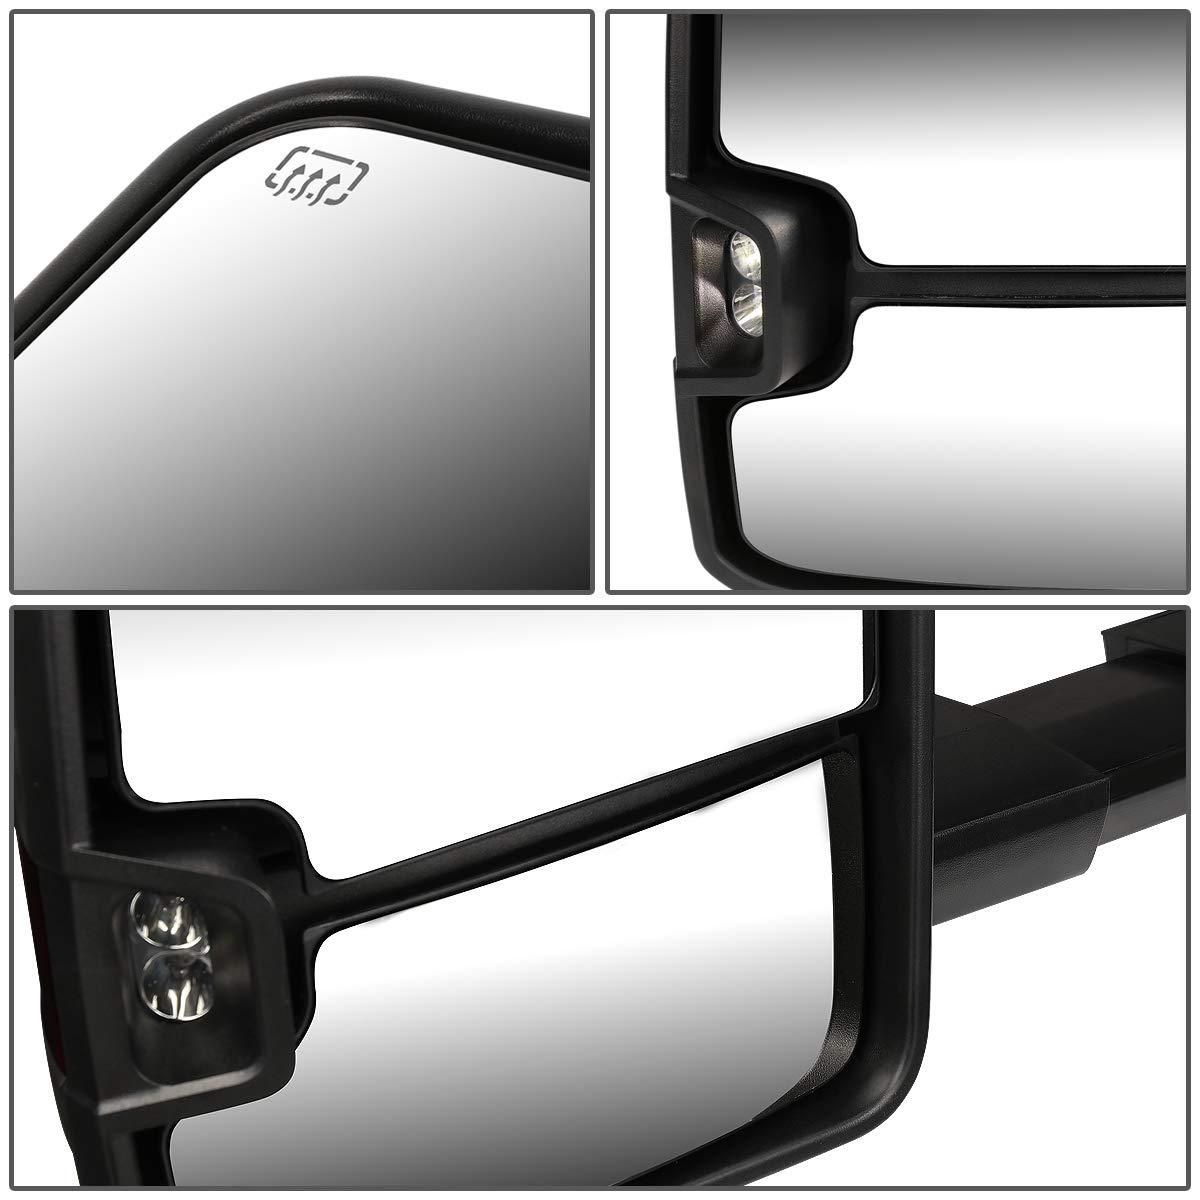 Pair Powered+Heated+LED Turn Signal Tow Towing Mirror for Chevy Silverado Tahoe GMC Sierra Yukon 99-02